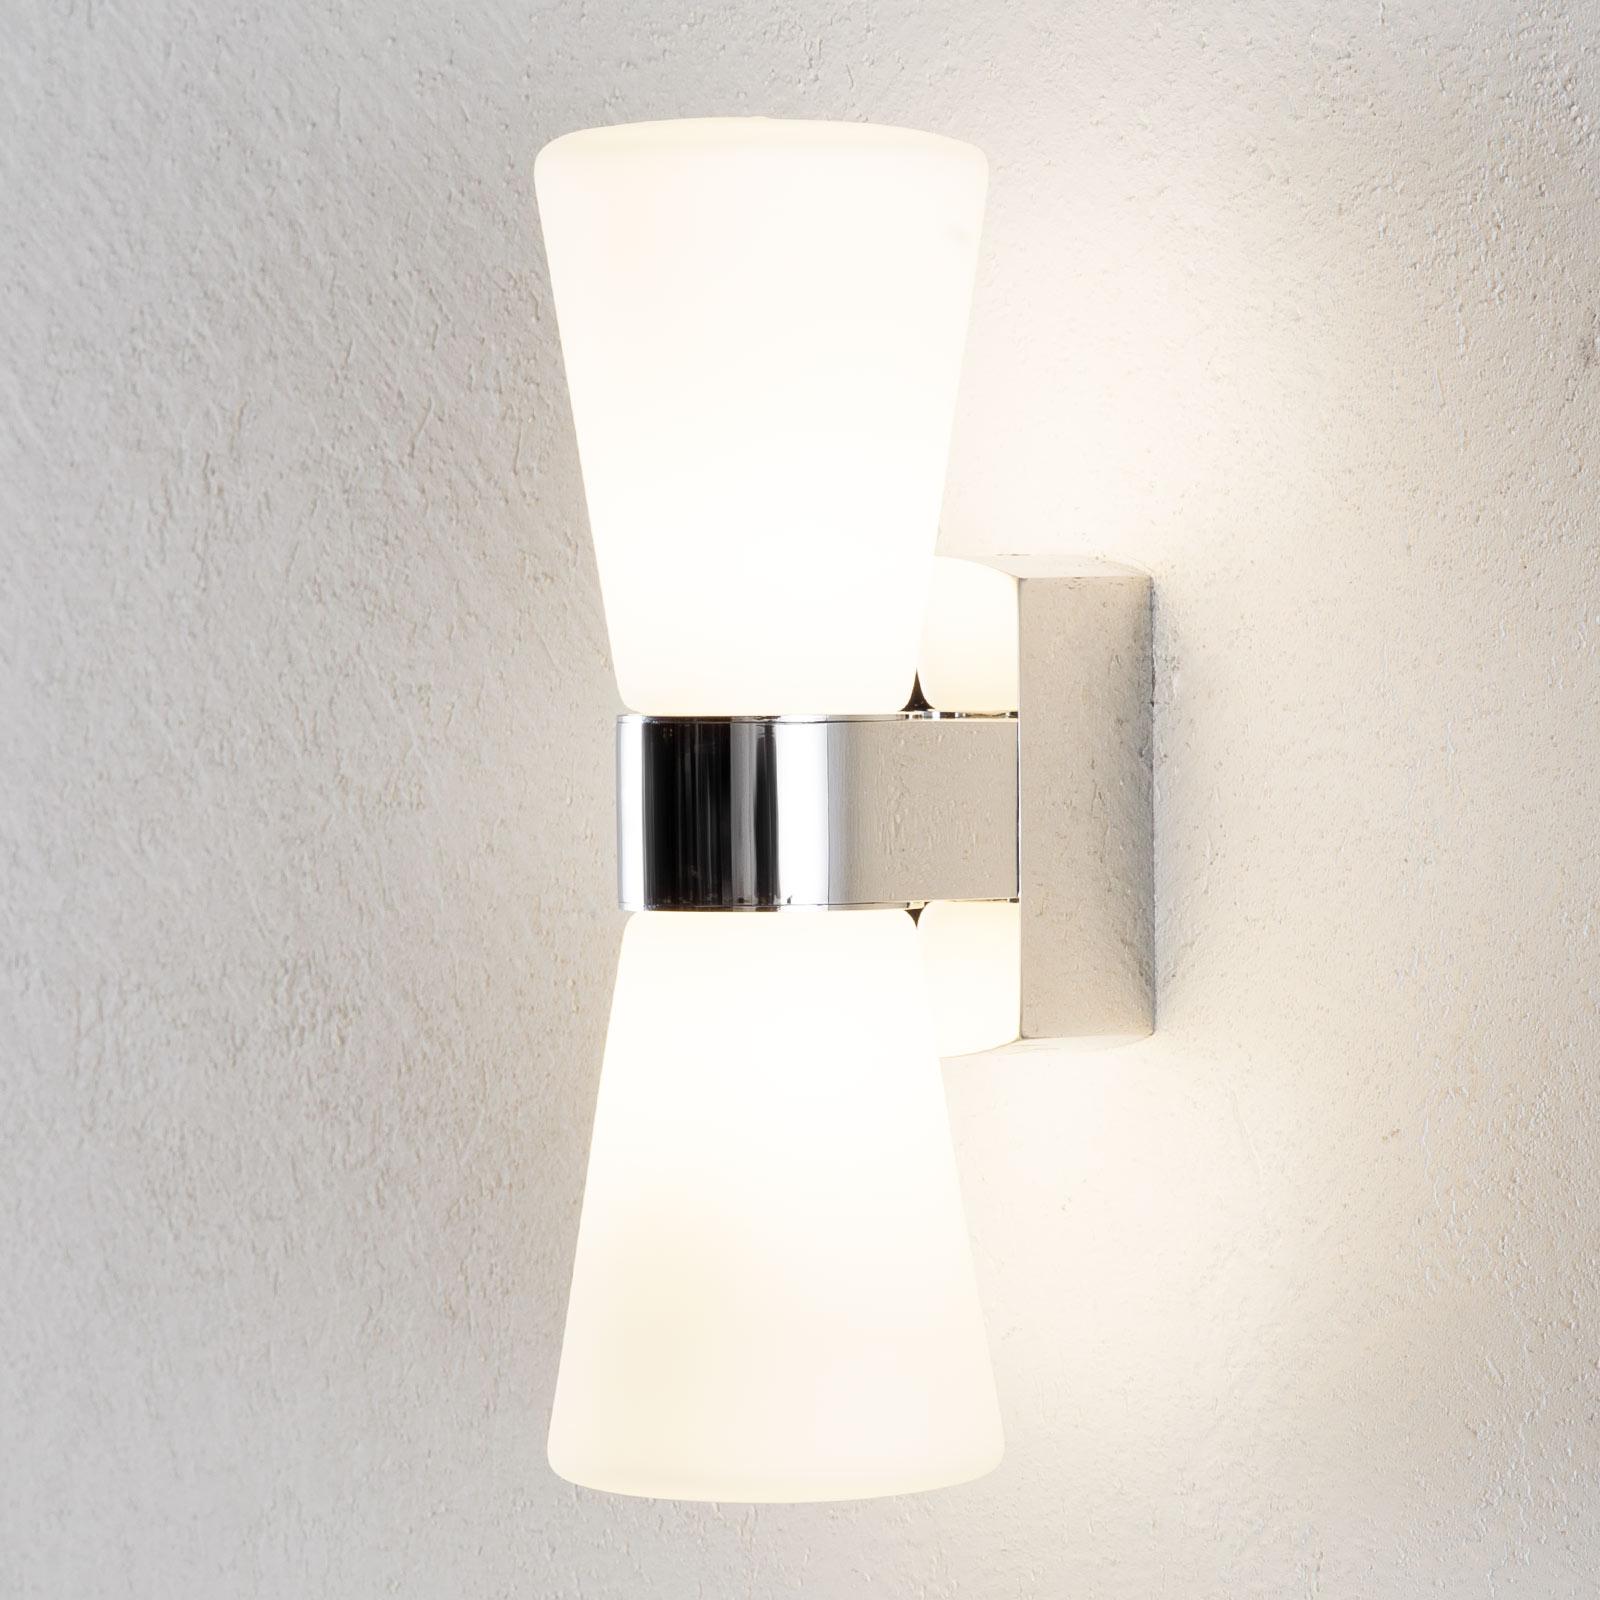 Mooi gevormde LED wandlamp Cailin - IP44